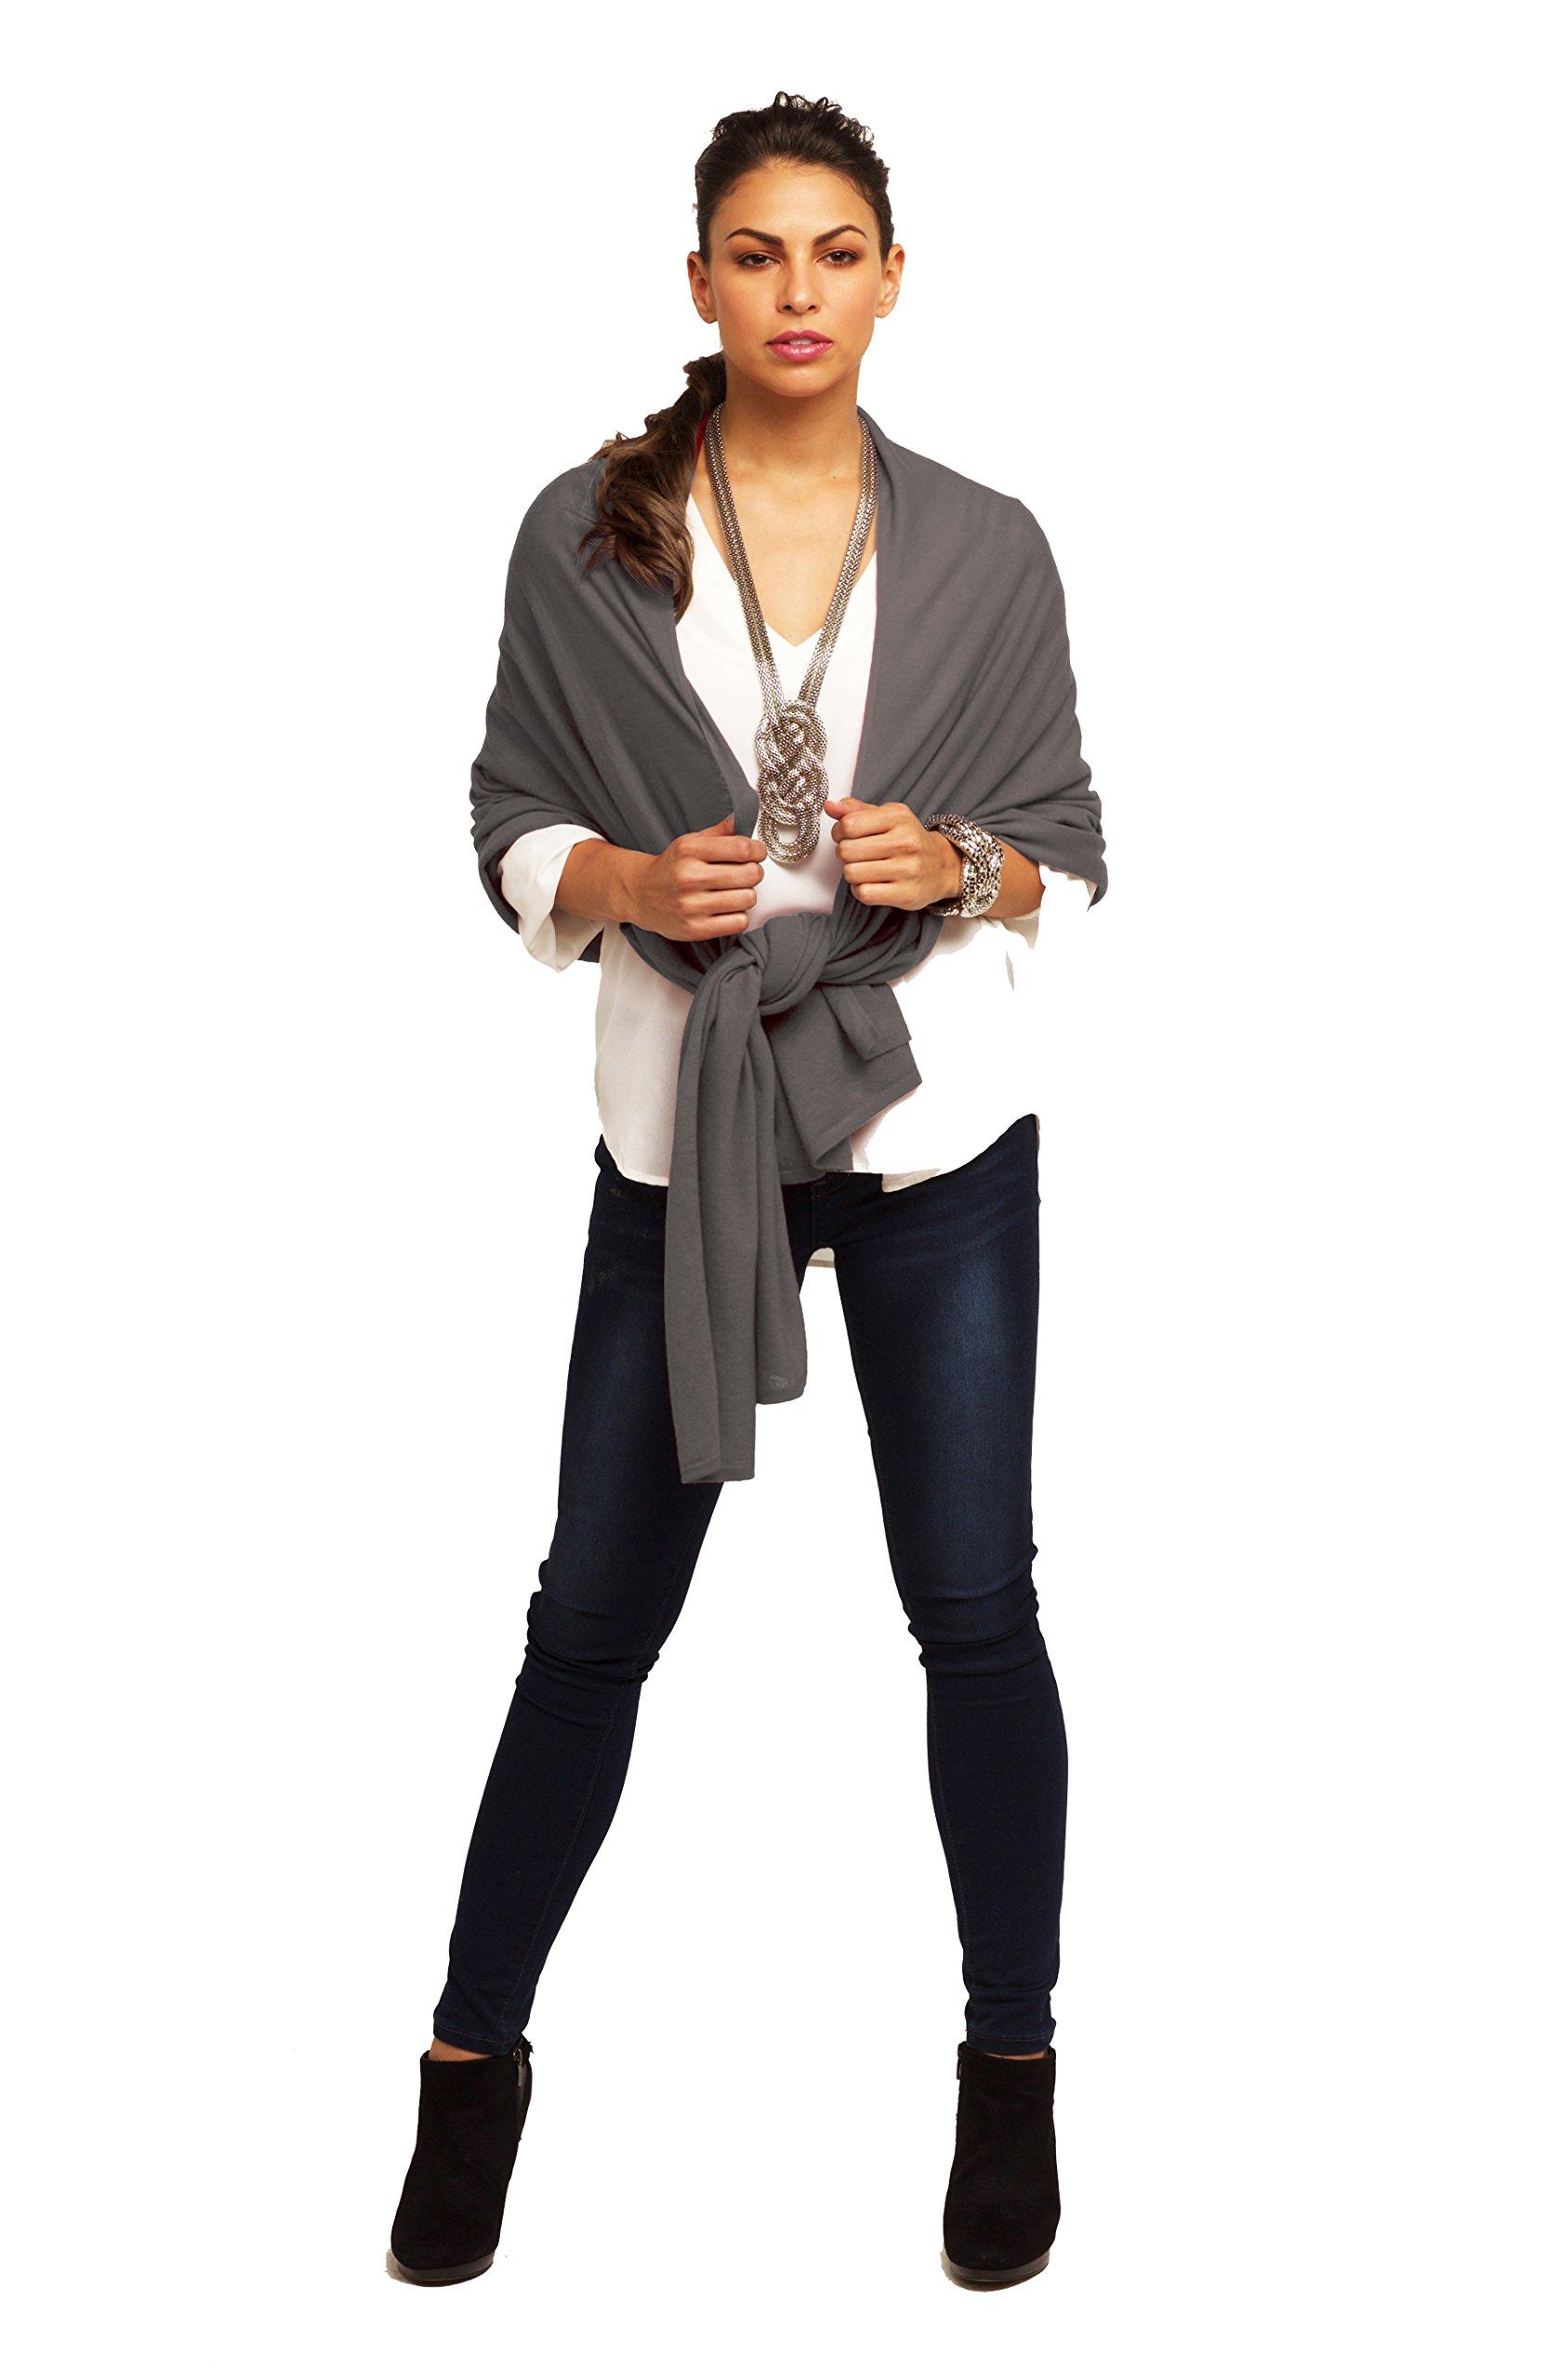 Super Soft Oversized 100% Cashmere Travel Blanket Scarf Wrap - Warm Charcoal